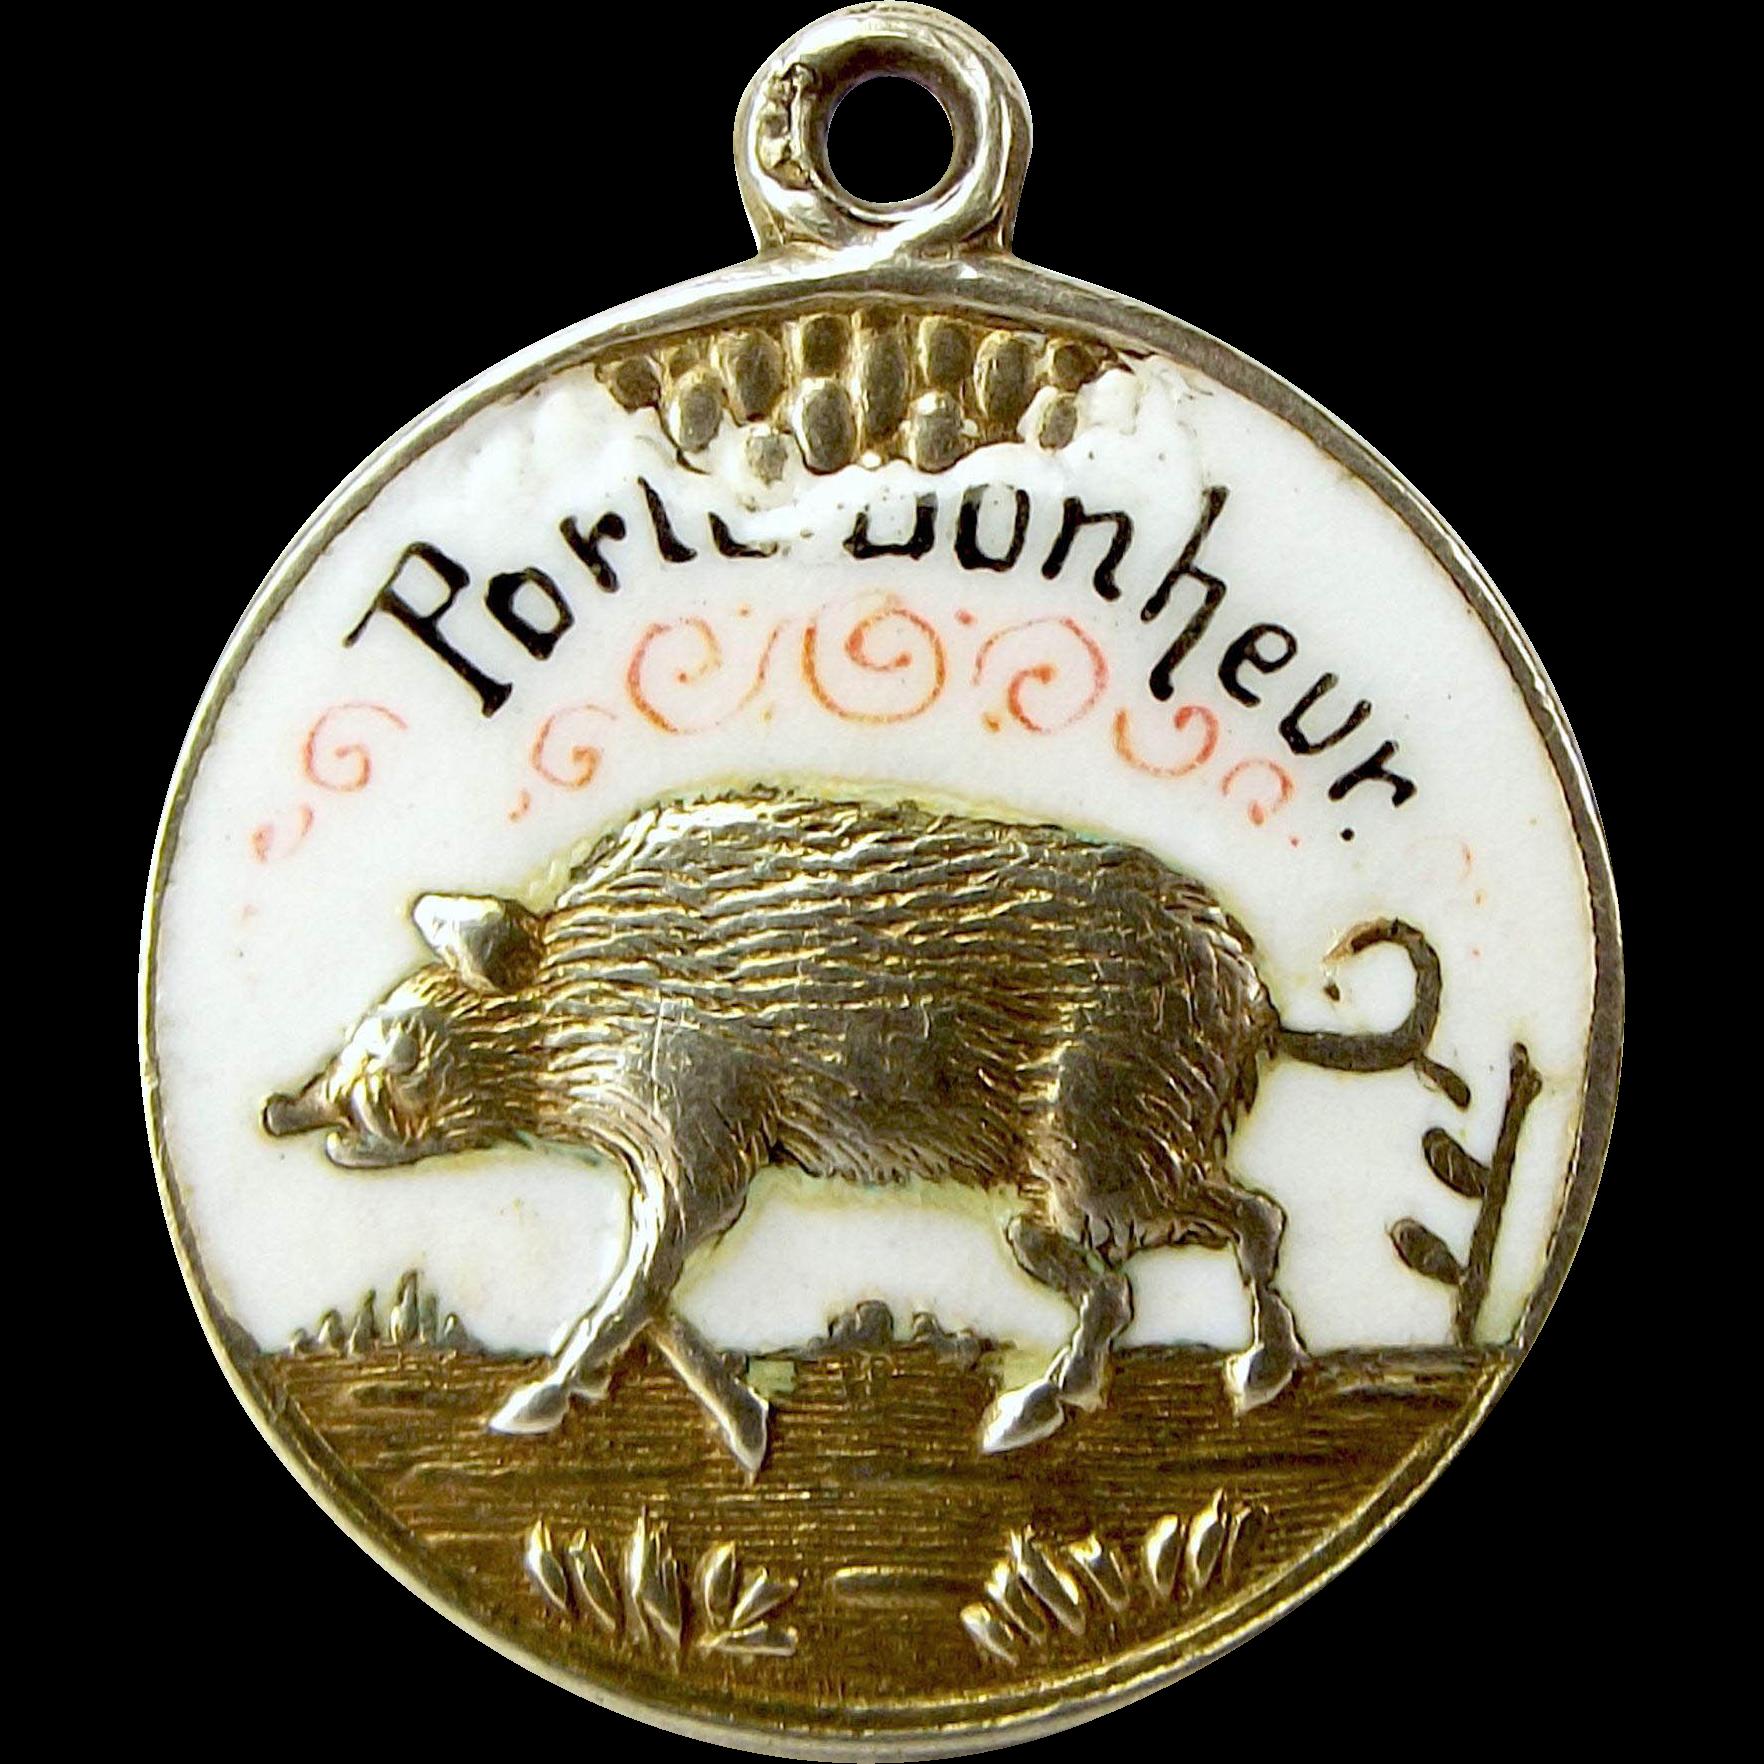 Vintage french porte bonheur 900 silver charm enamel lucky for French porte